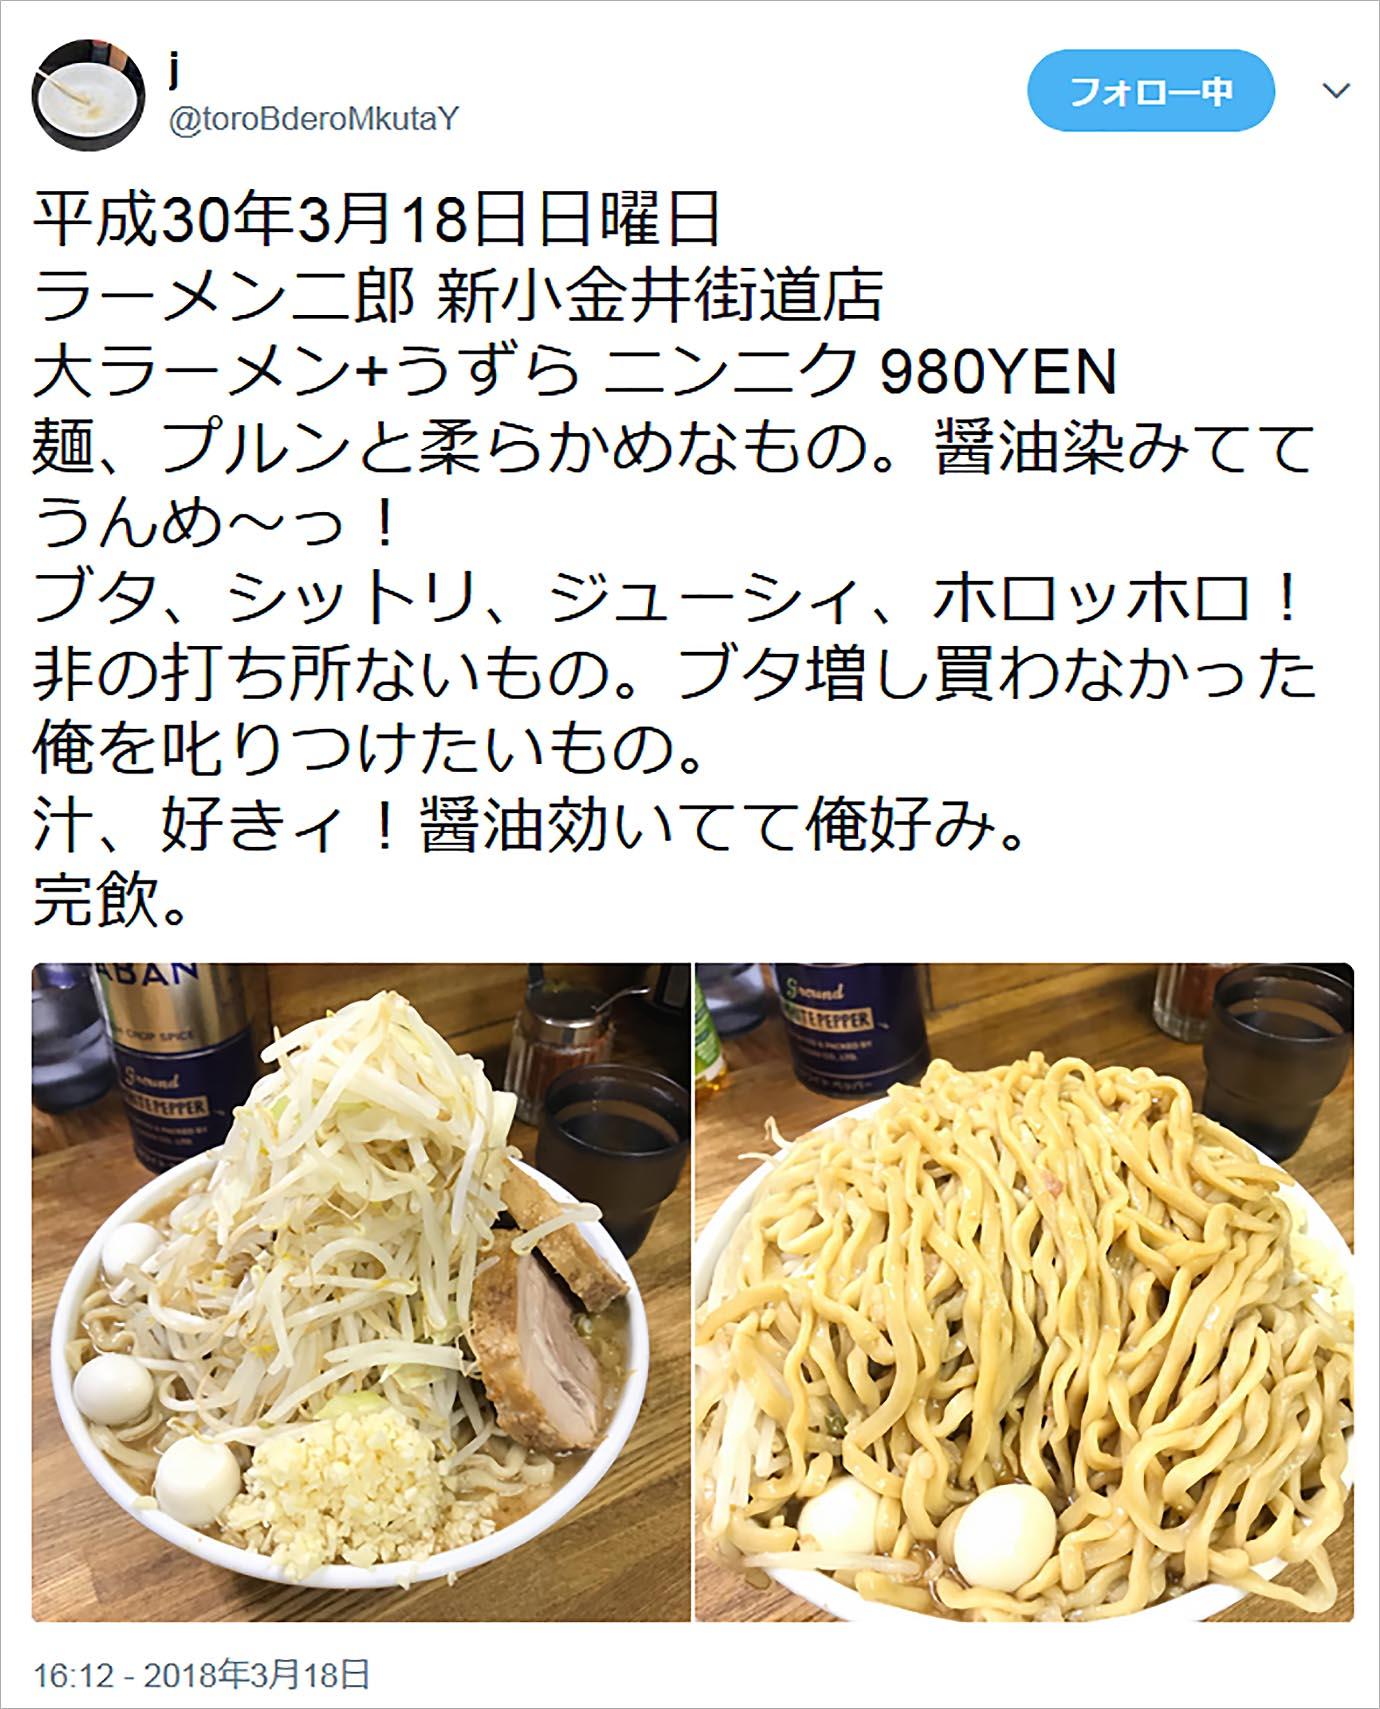 habomaijiro-ramen-jiro